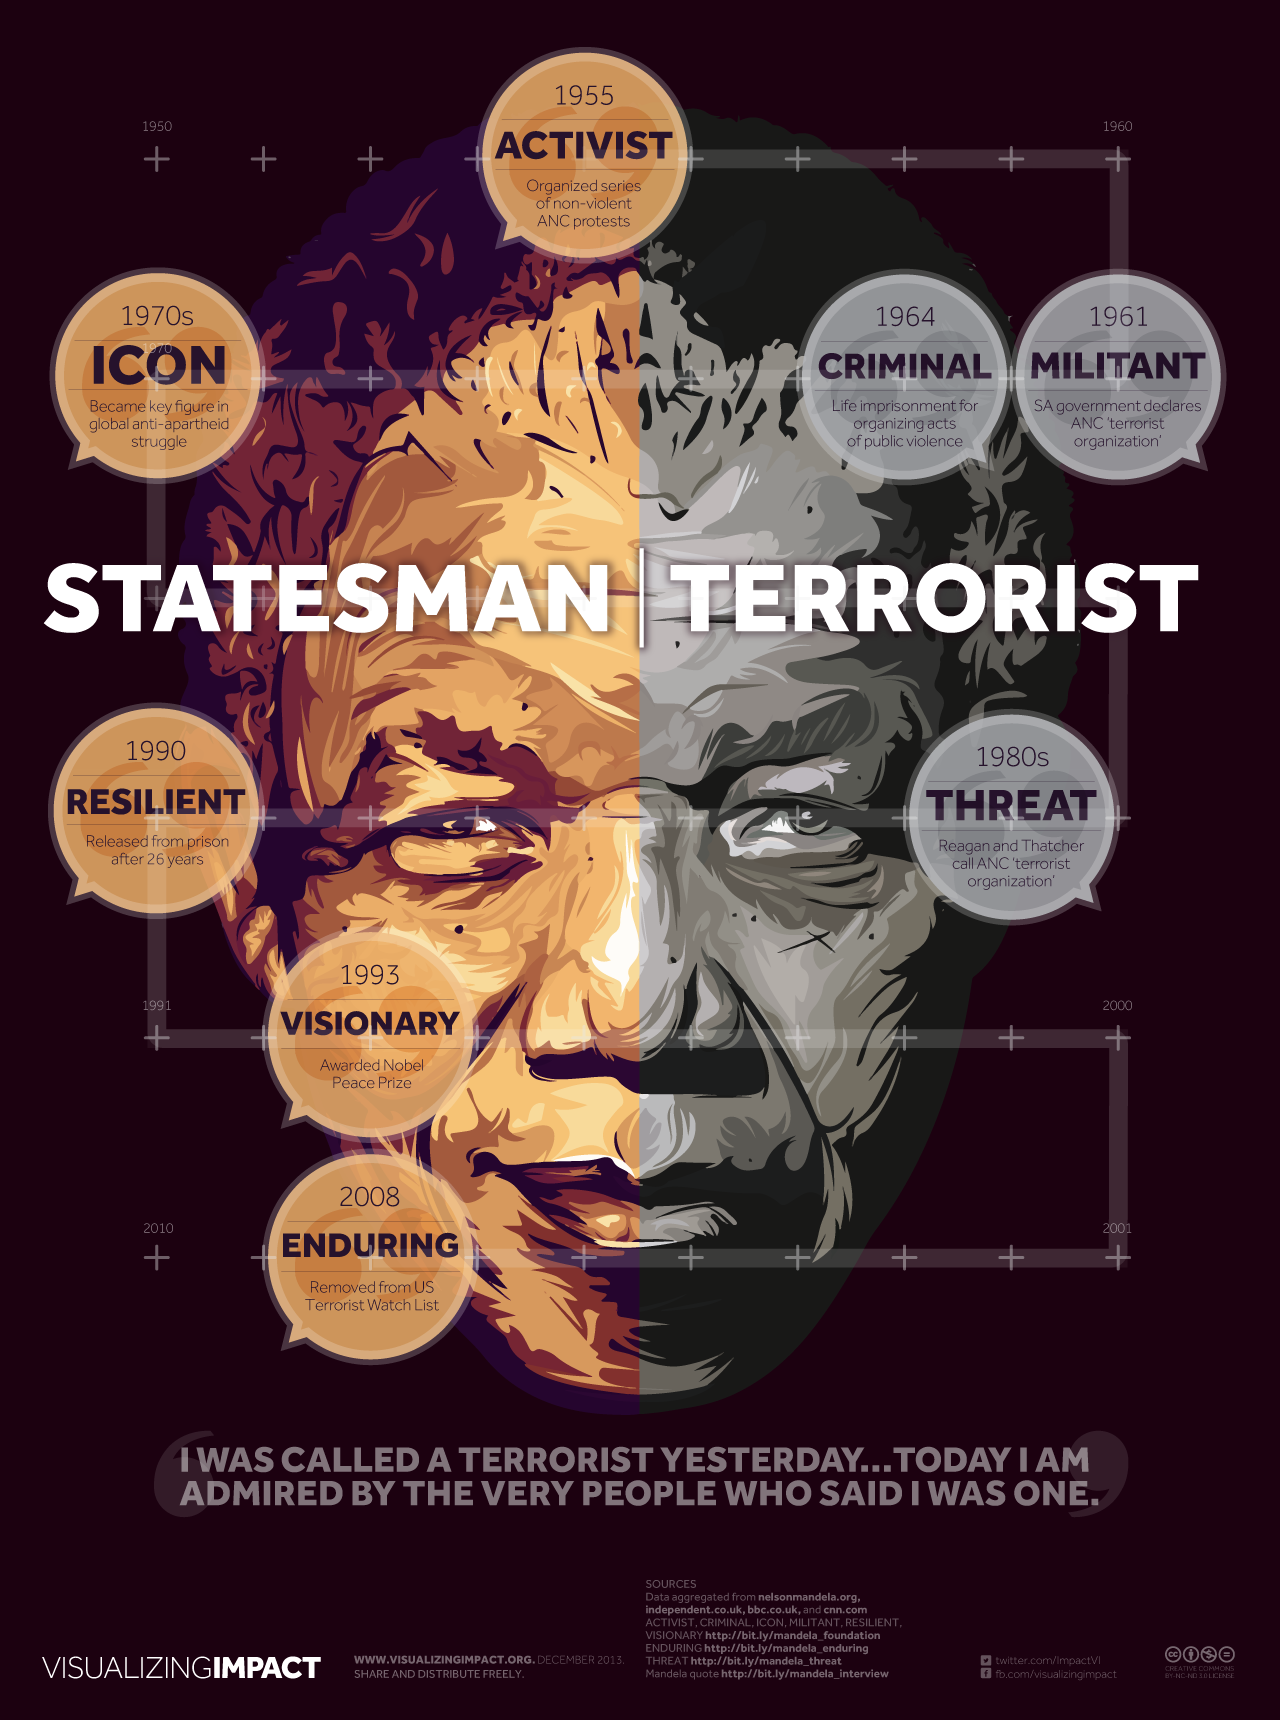 Nelson Mandela Funeral Memorial Visualizing Impact